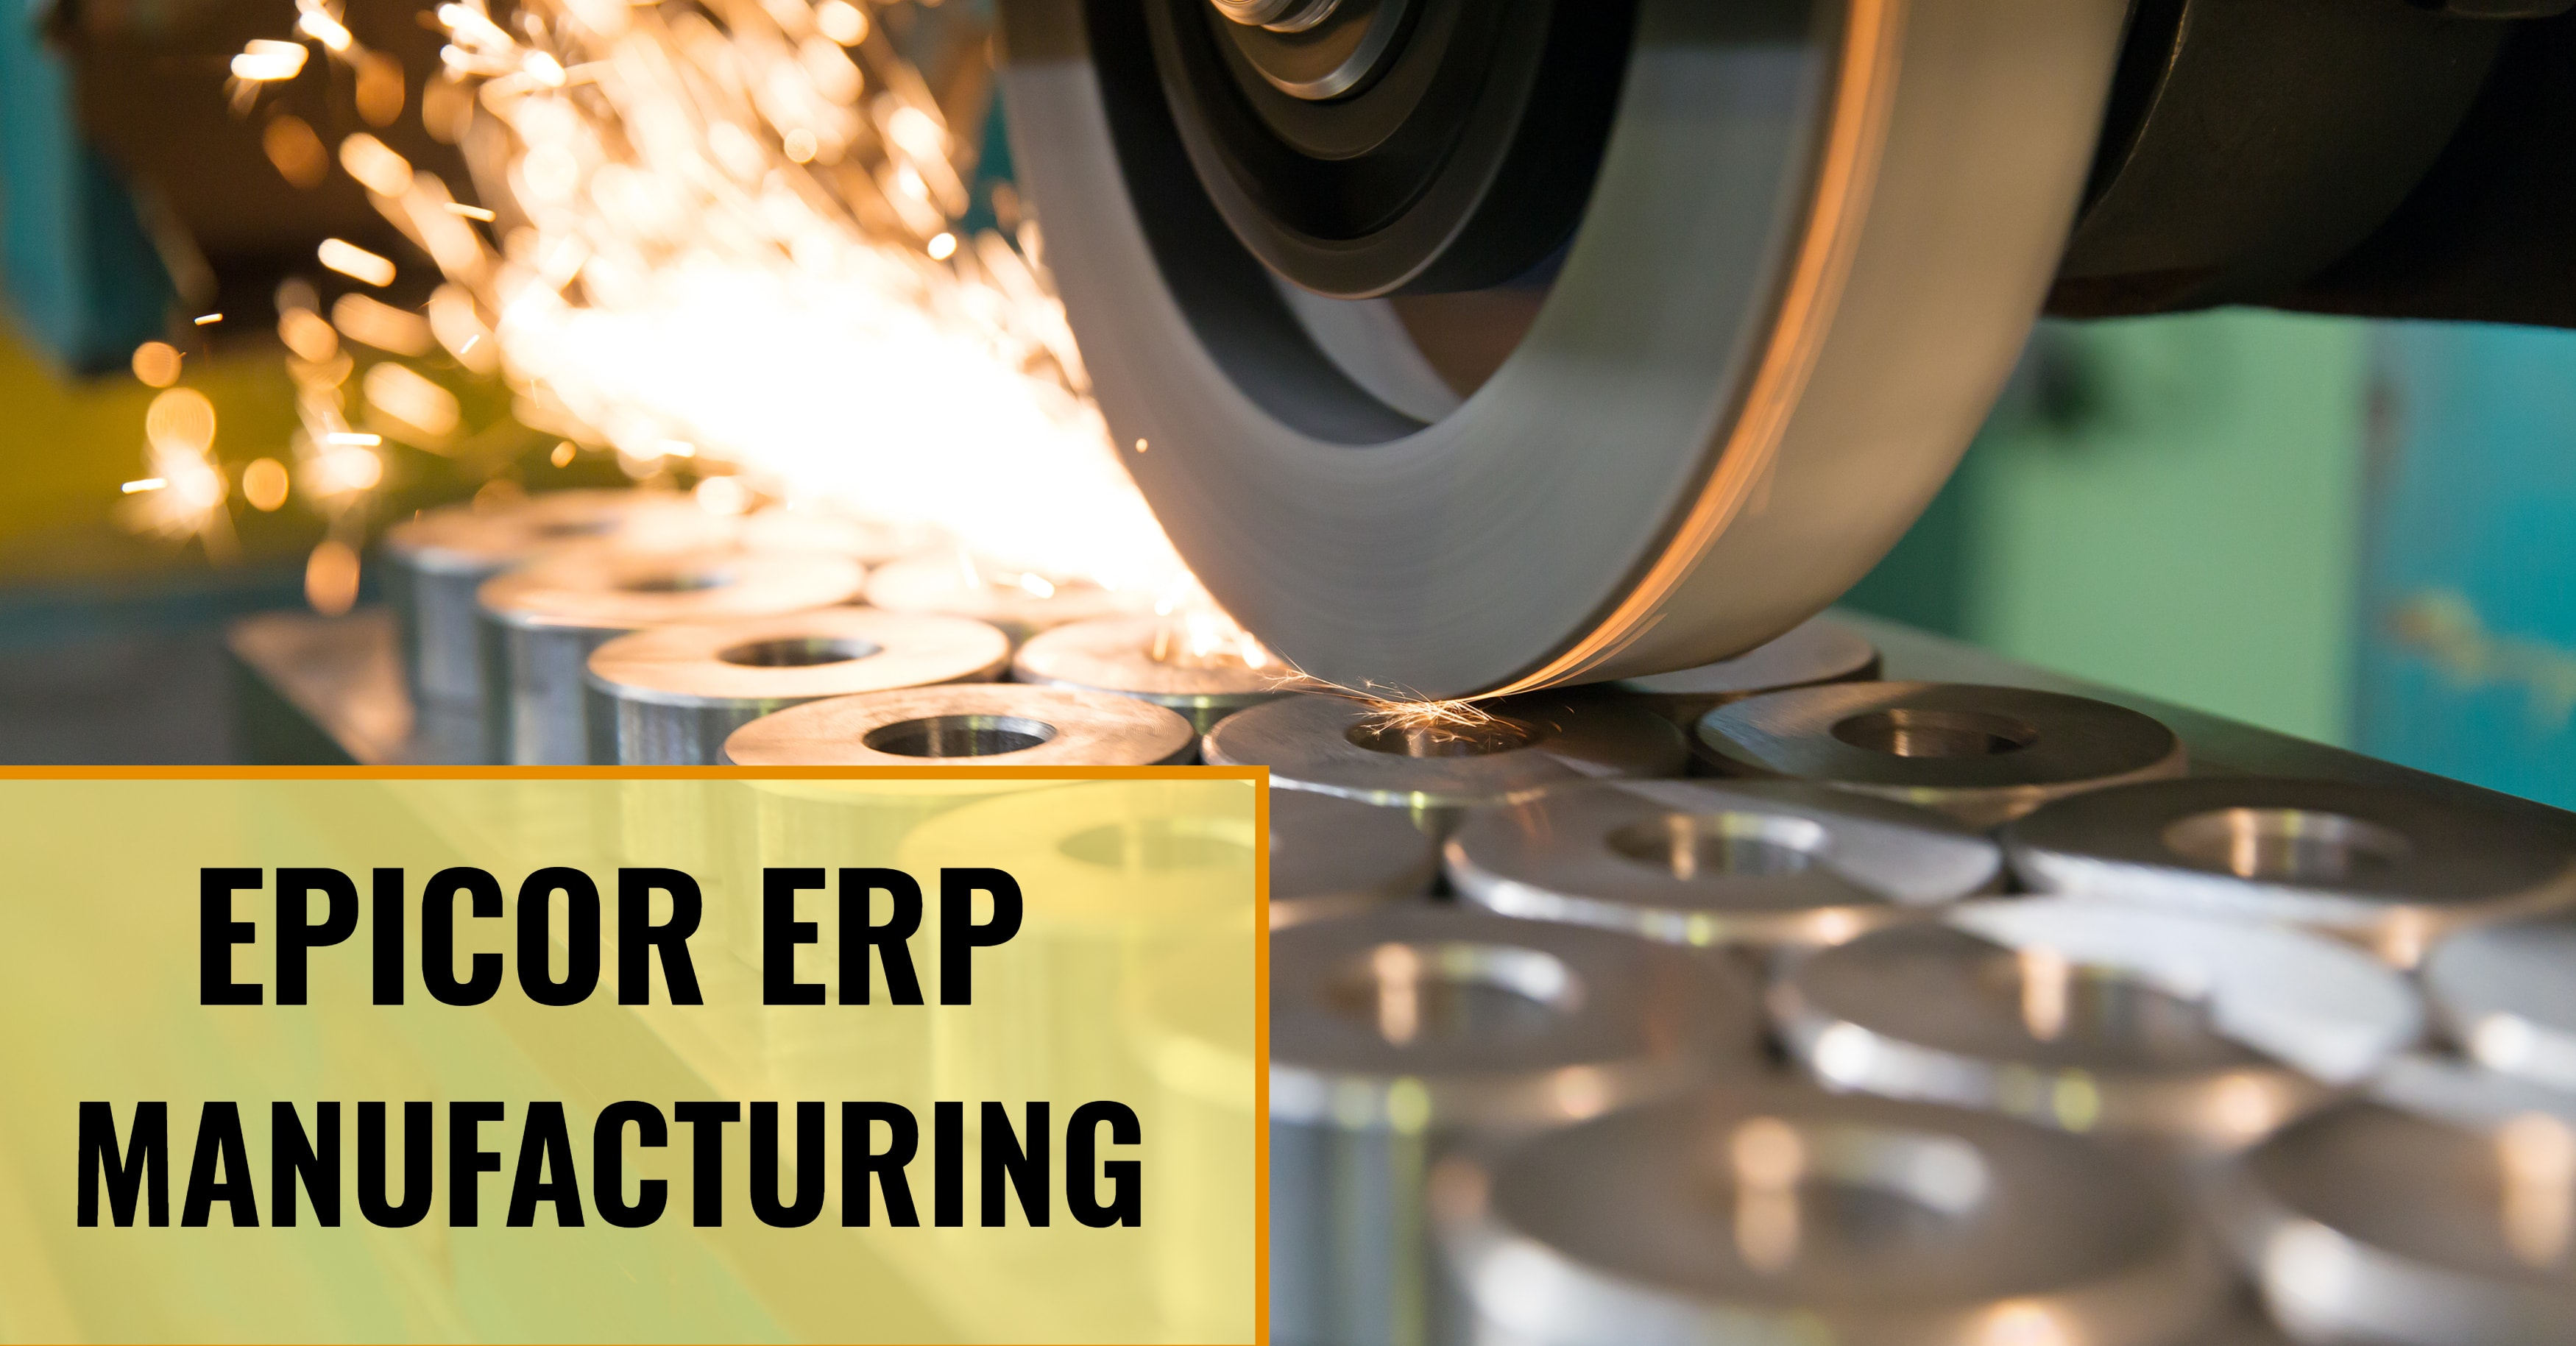 Epicor ERP Manufacturing